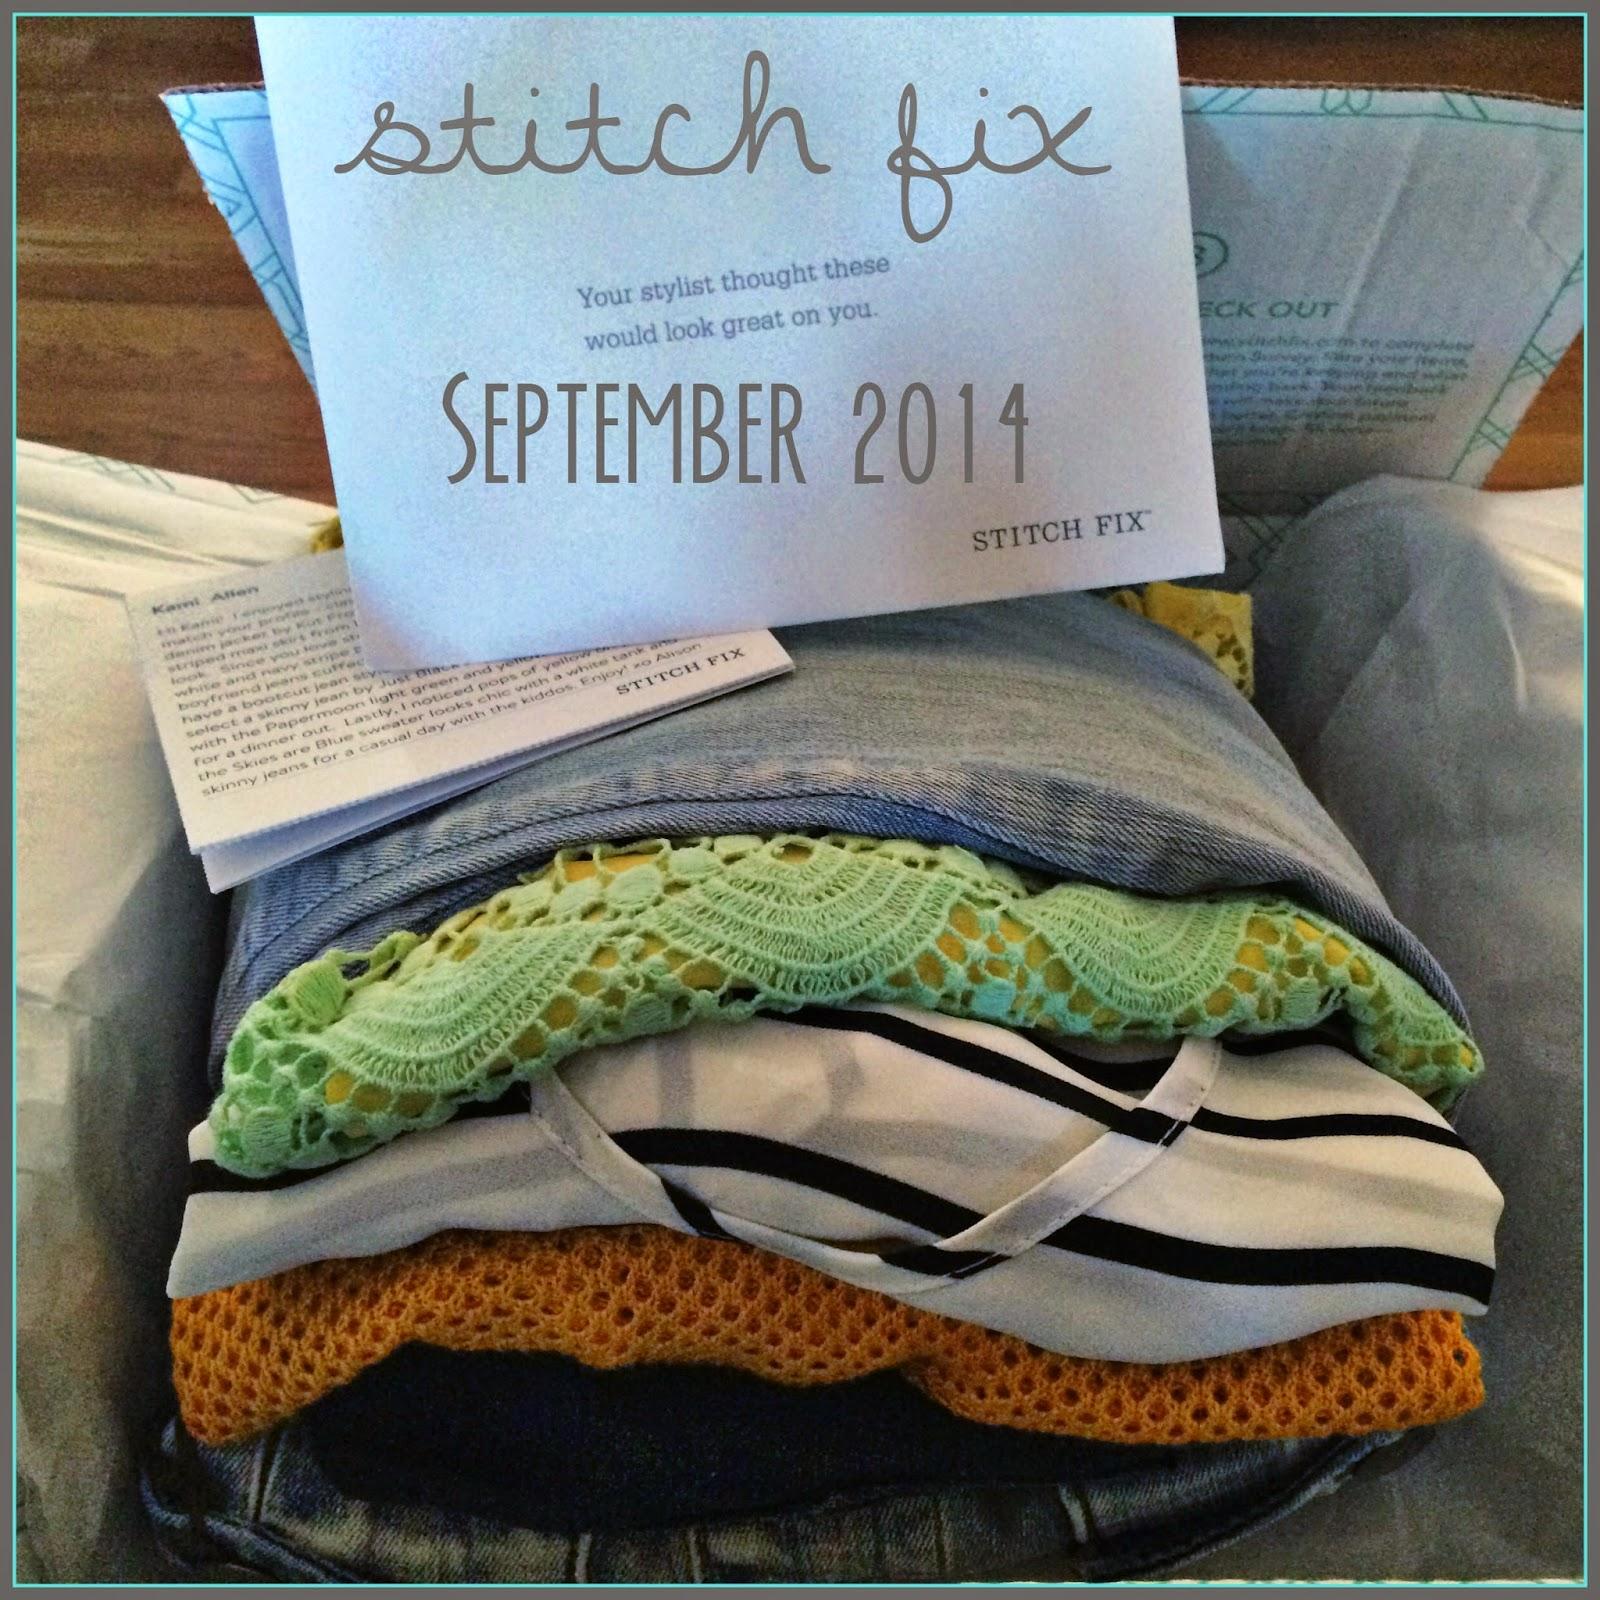 #stitchfix september 2014